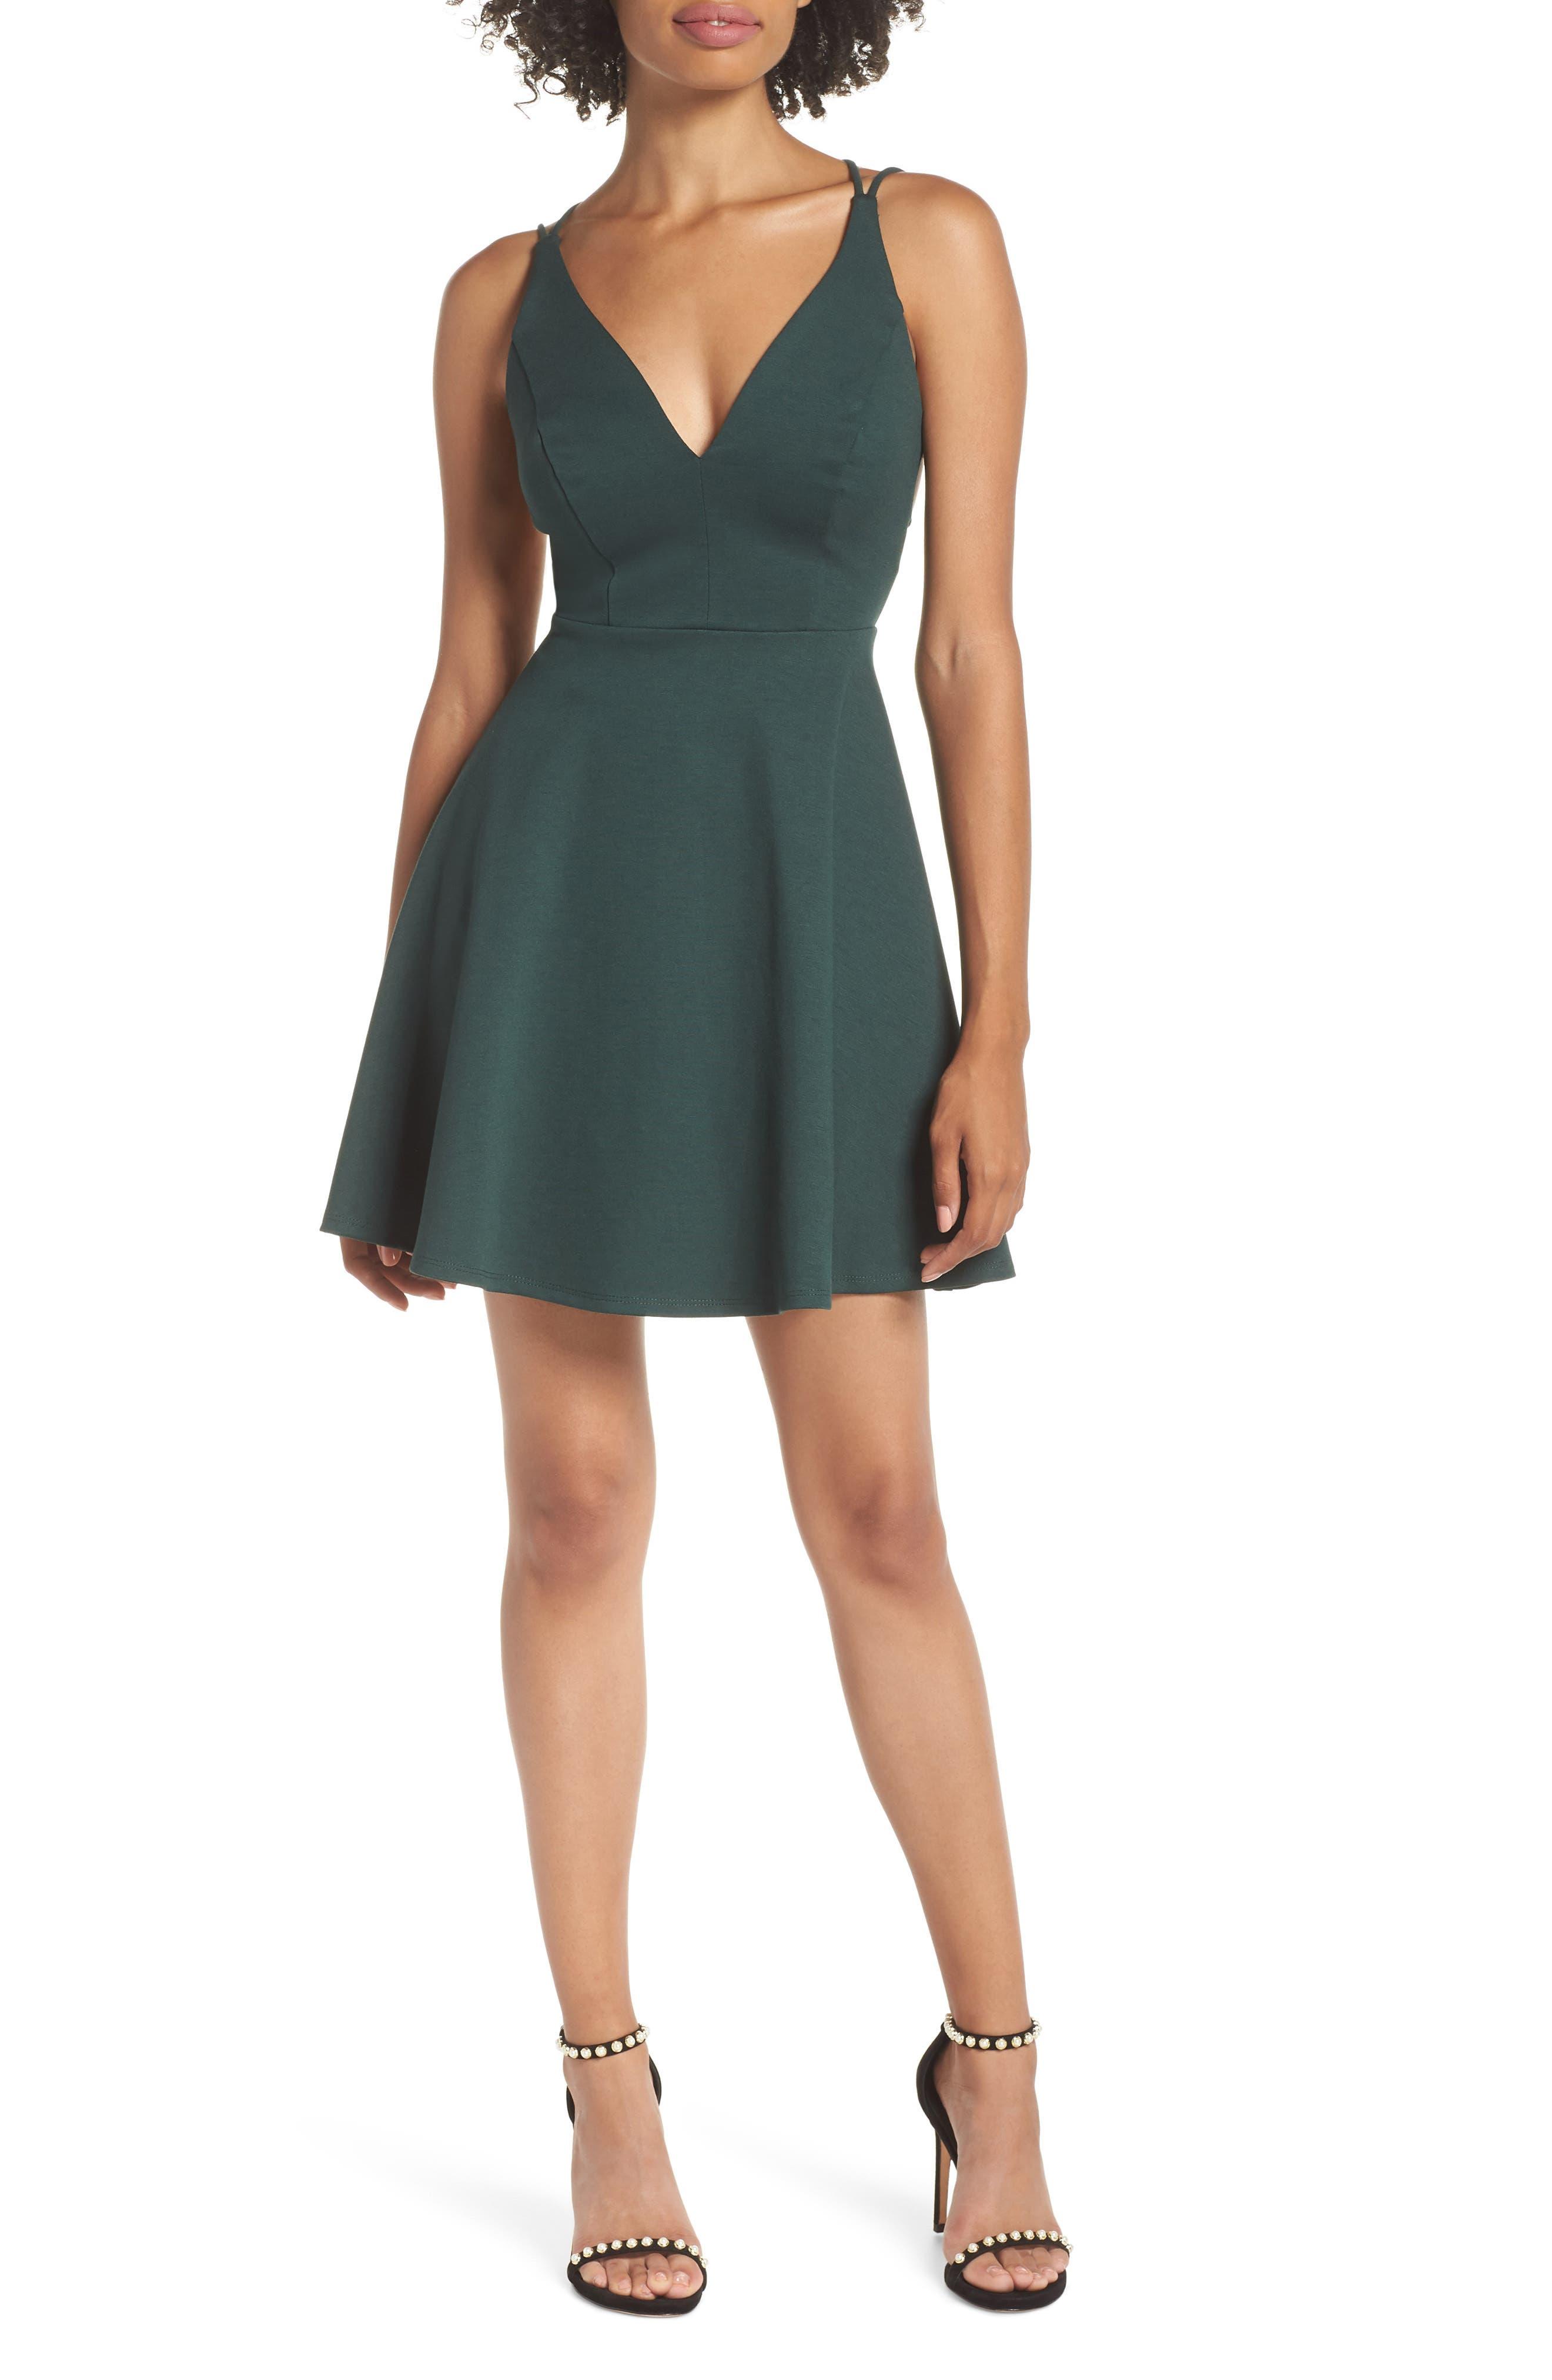 Lulus Believe In Love Strappy Back Skater Dress, Green